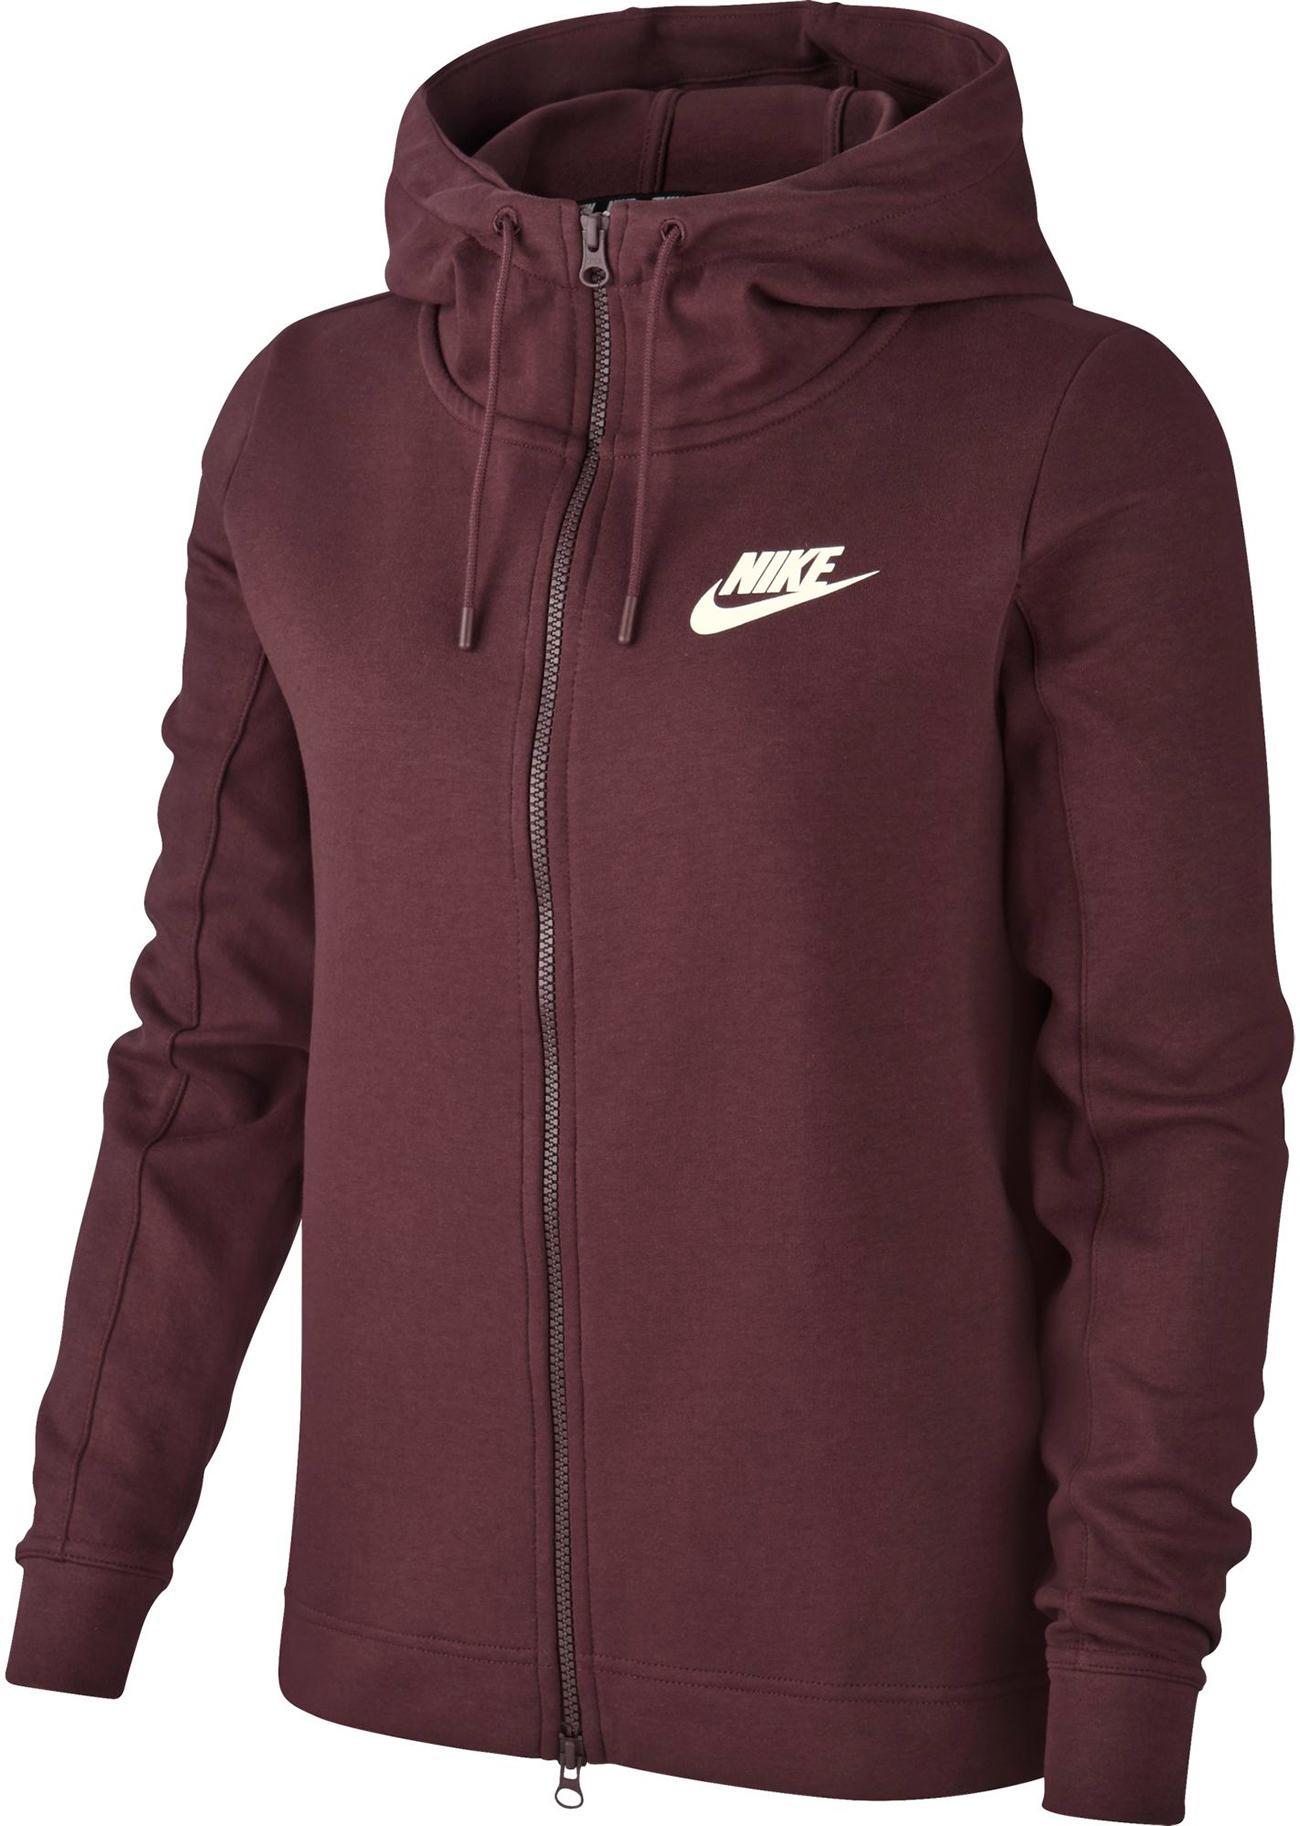 Nike jacke damen preise